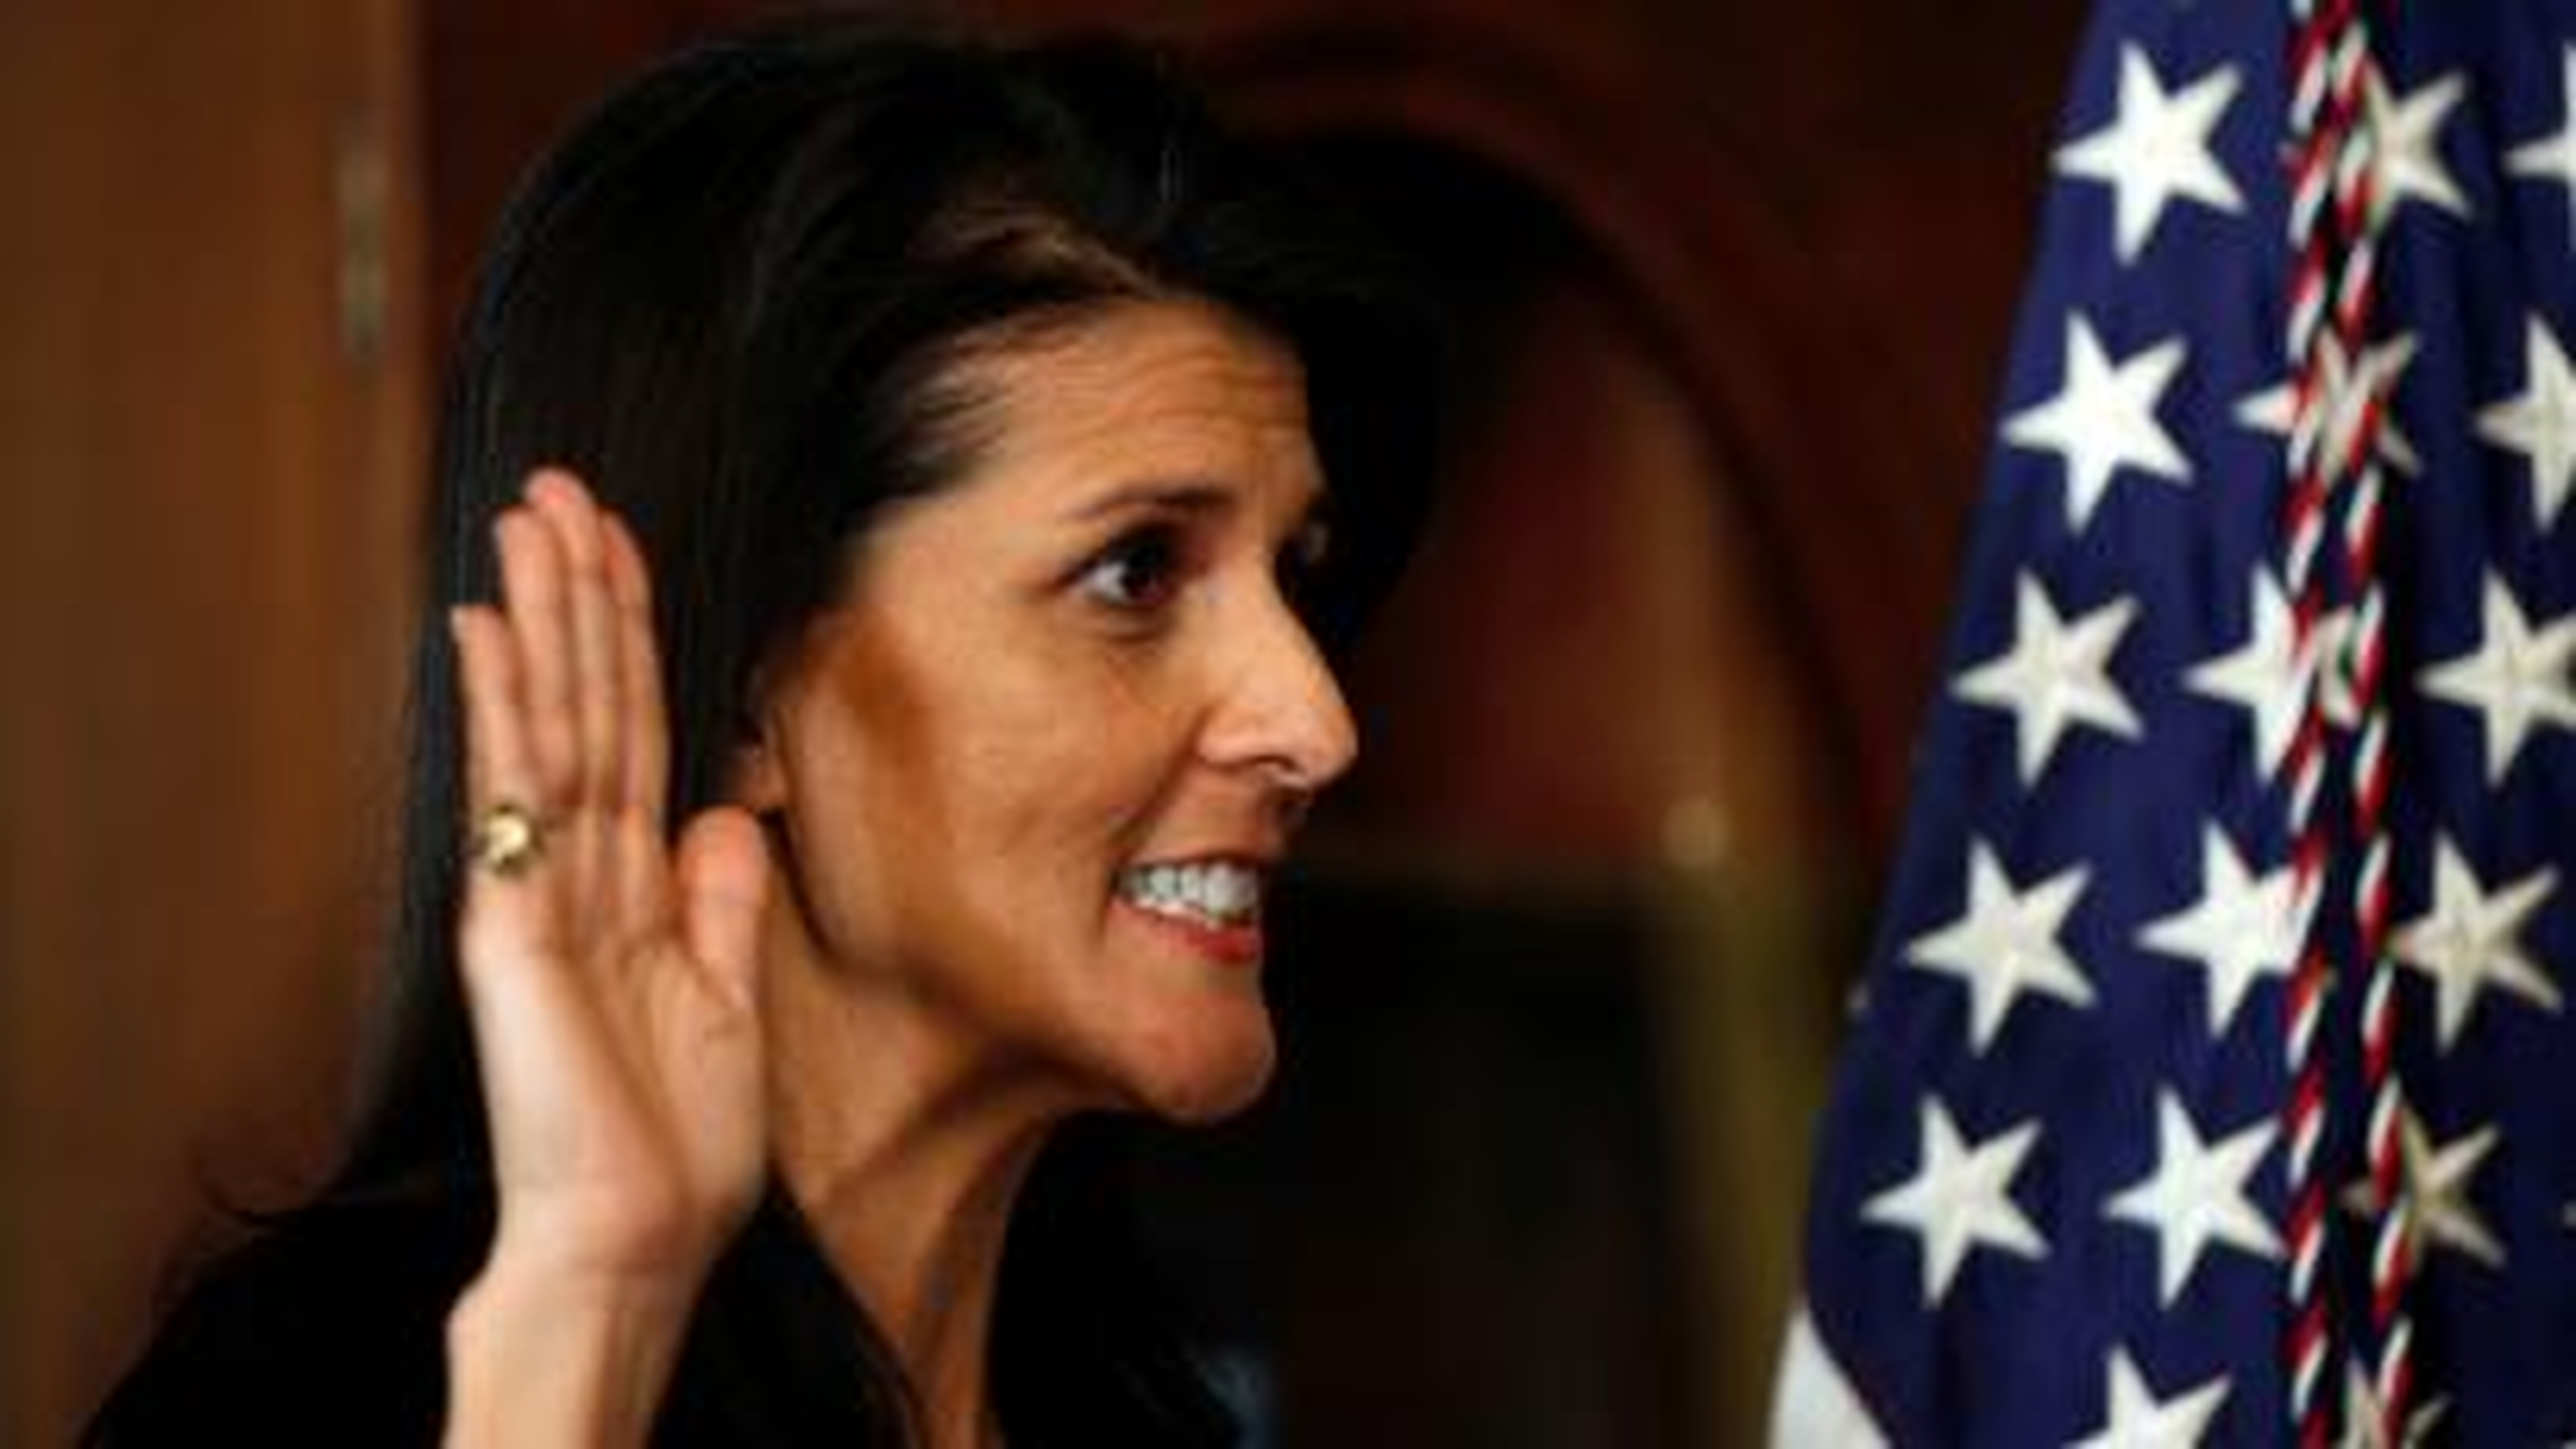 Nikki Haley human rights US leadership UN ambassador